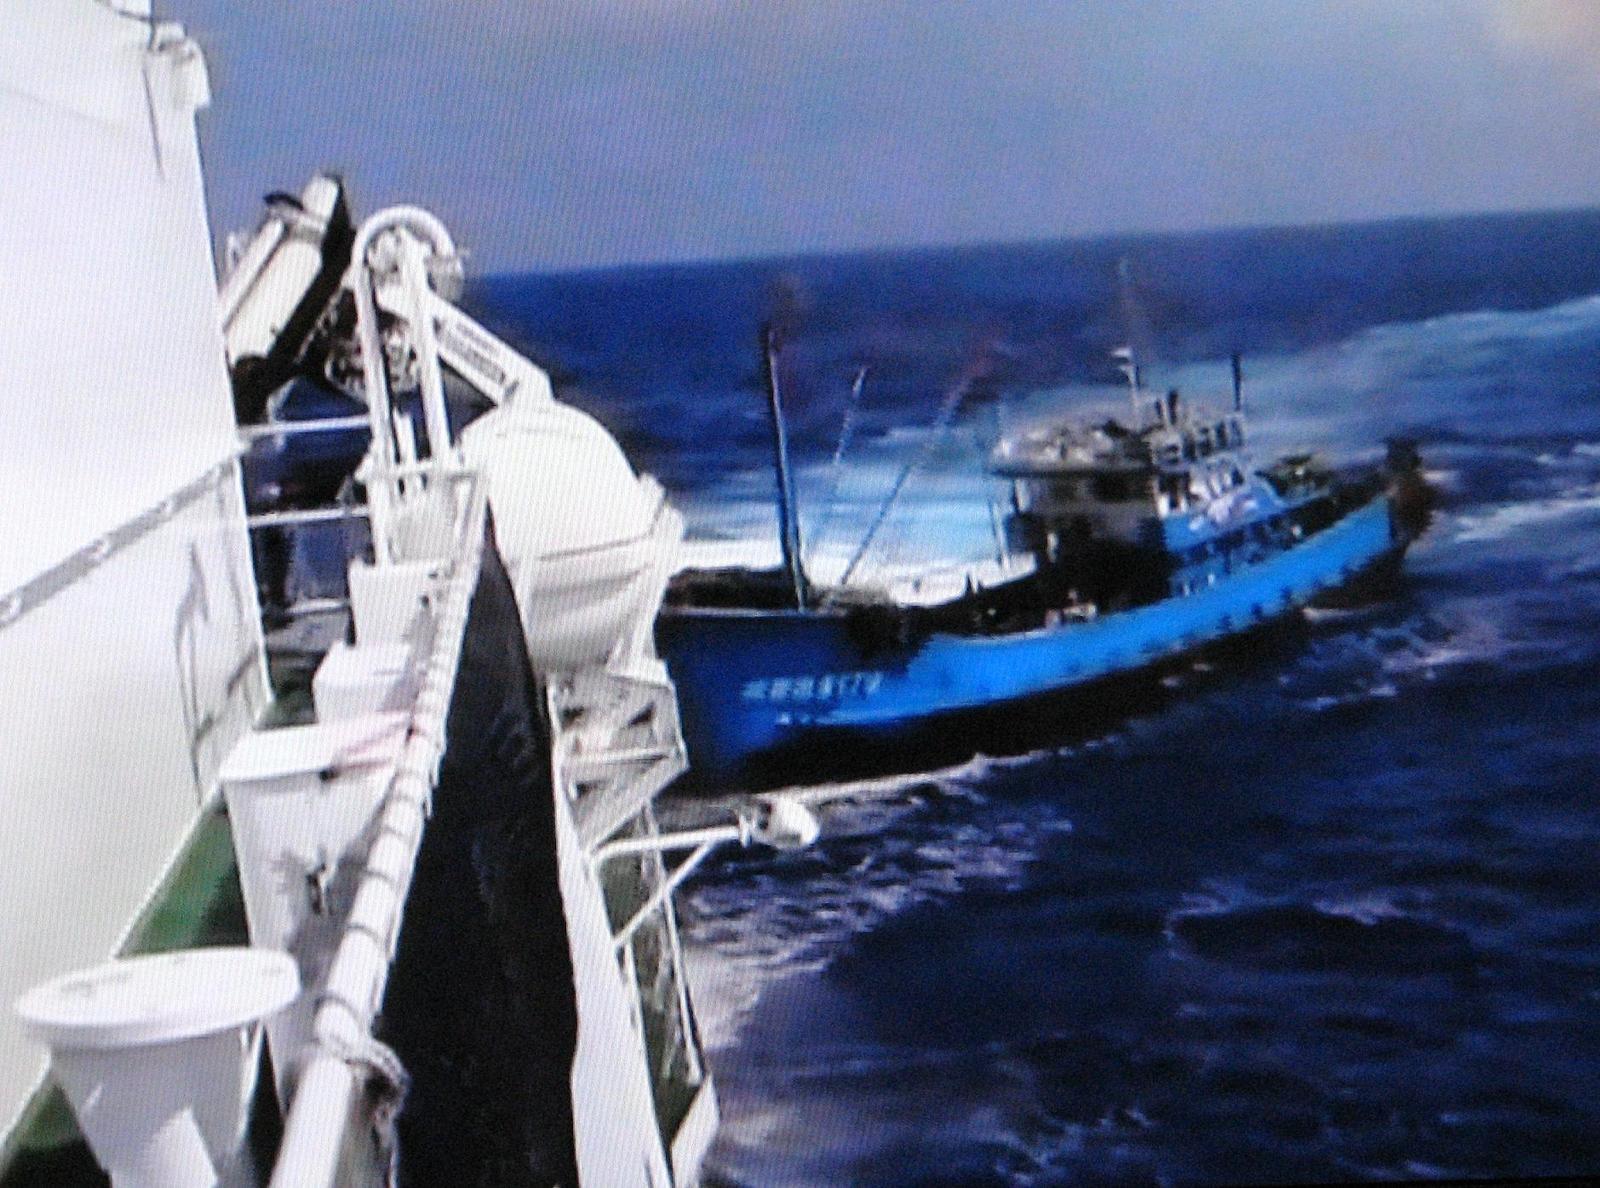 2010 Senkaku boat collision incident